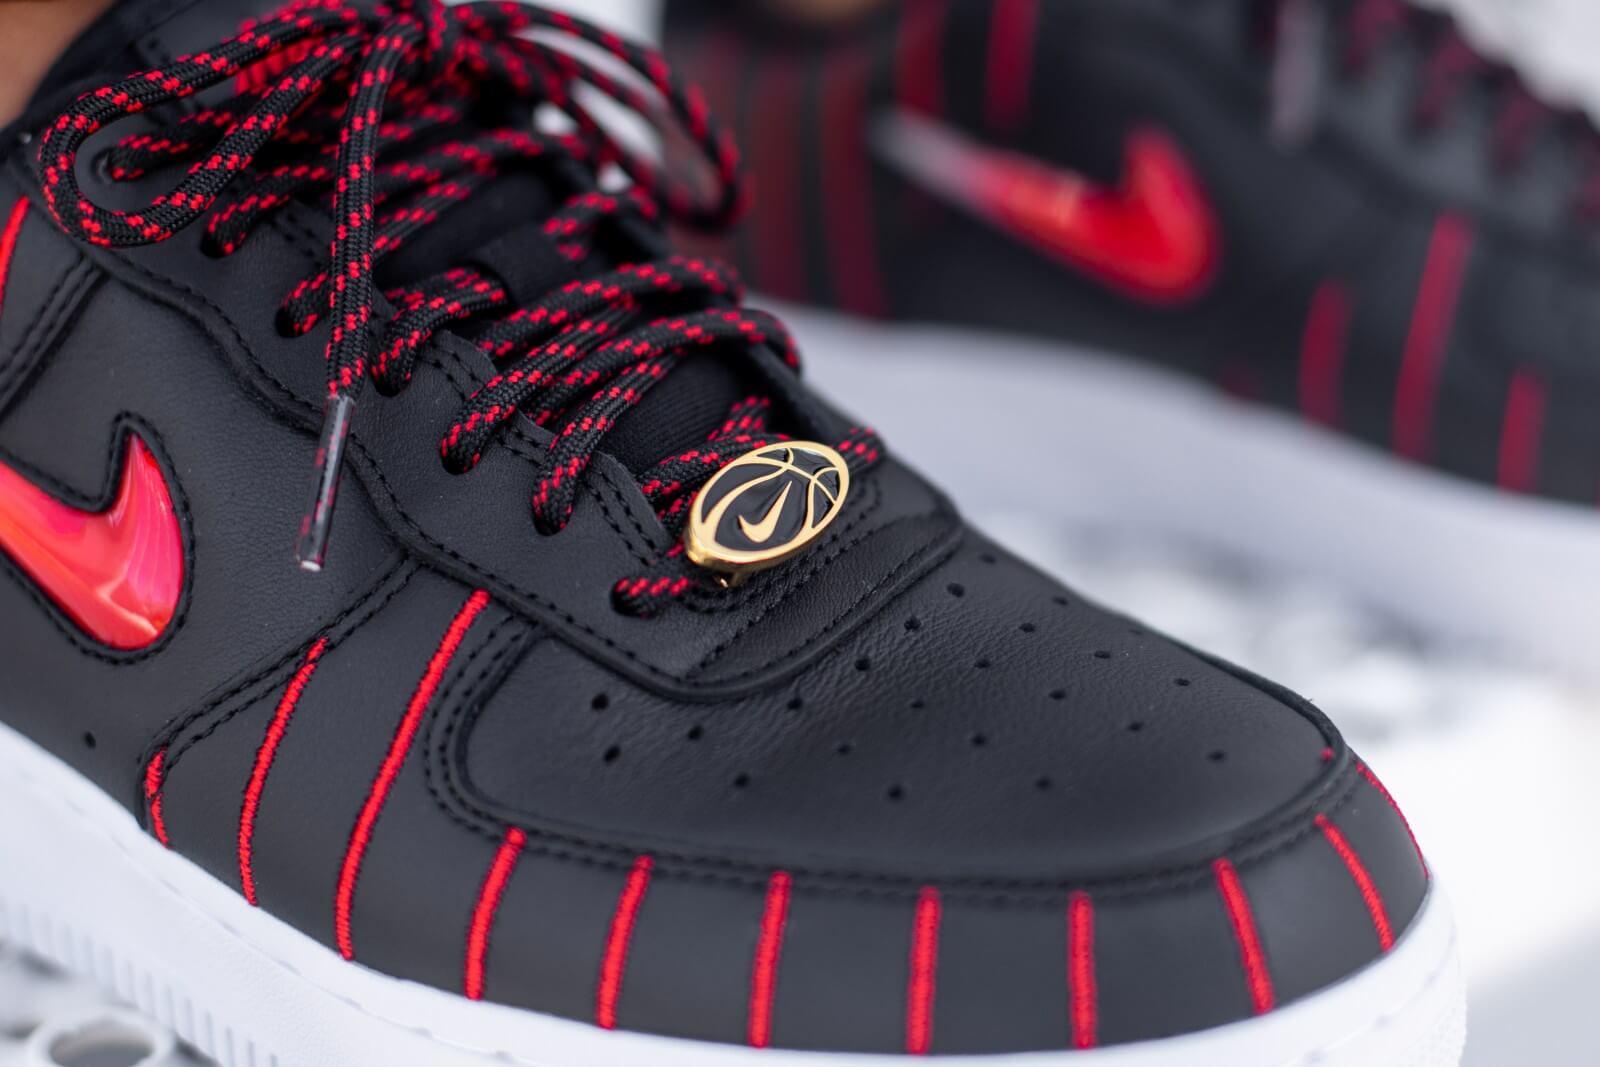 Nike Womens Air Force 1 07 Jewel QS Black/University Red